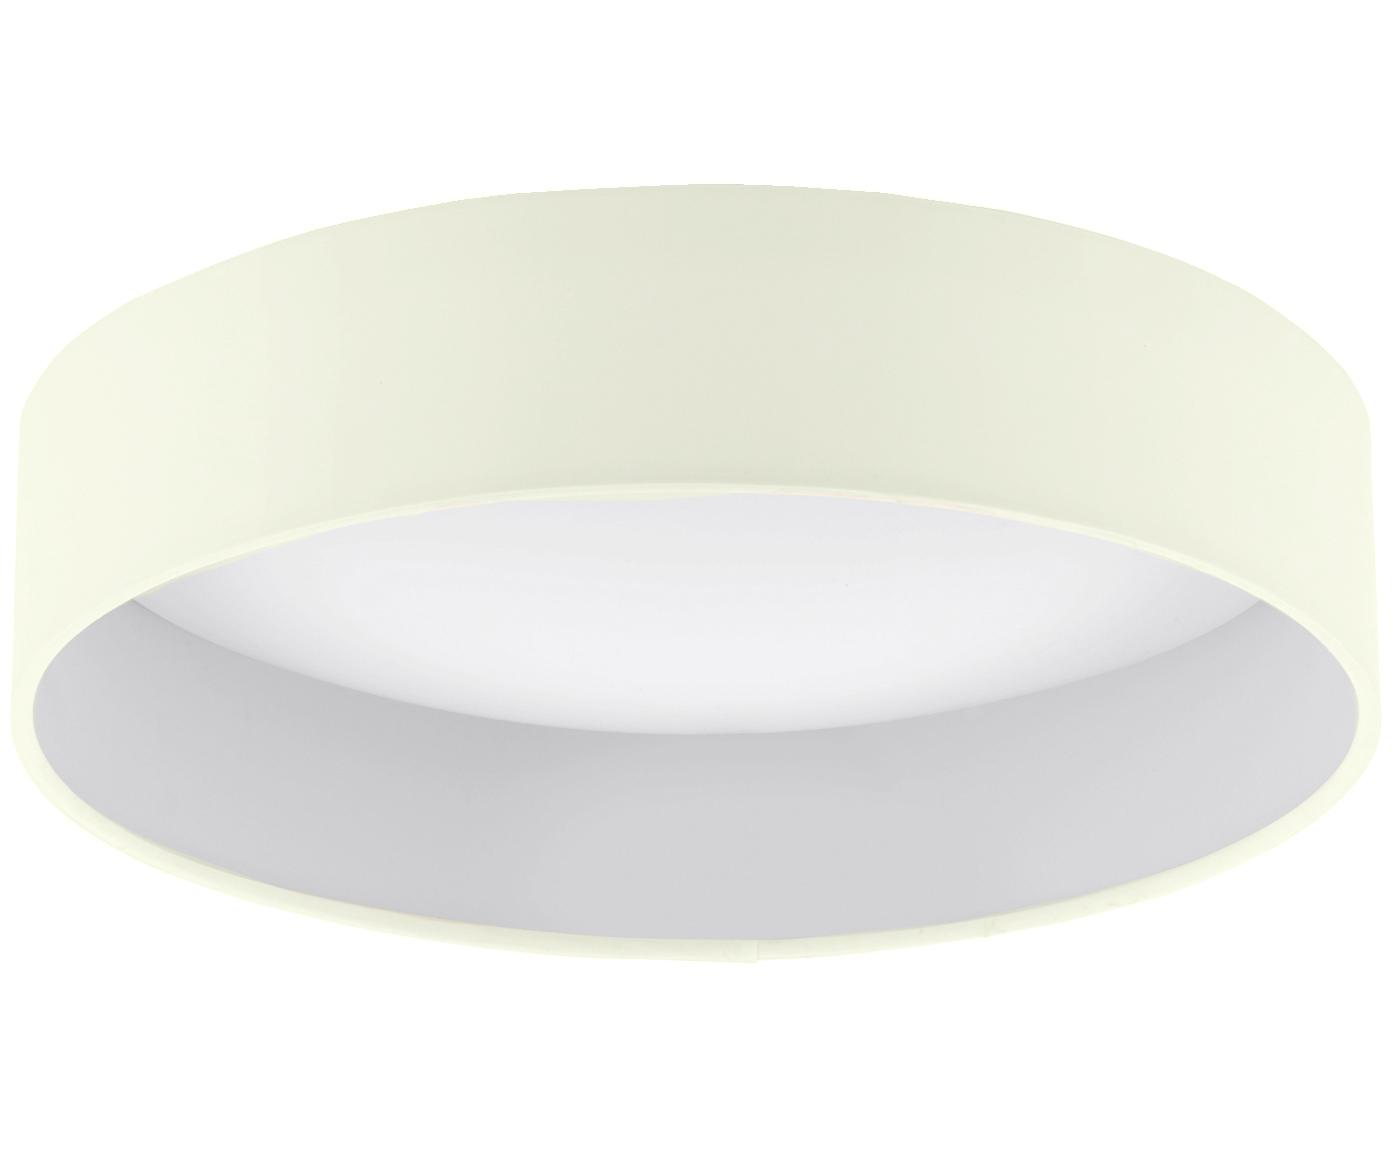 LED plafondlamp Paloma, Crèmekleurig, Ø 41 x H 10 cm